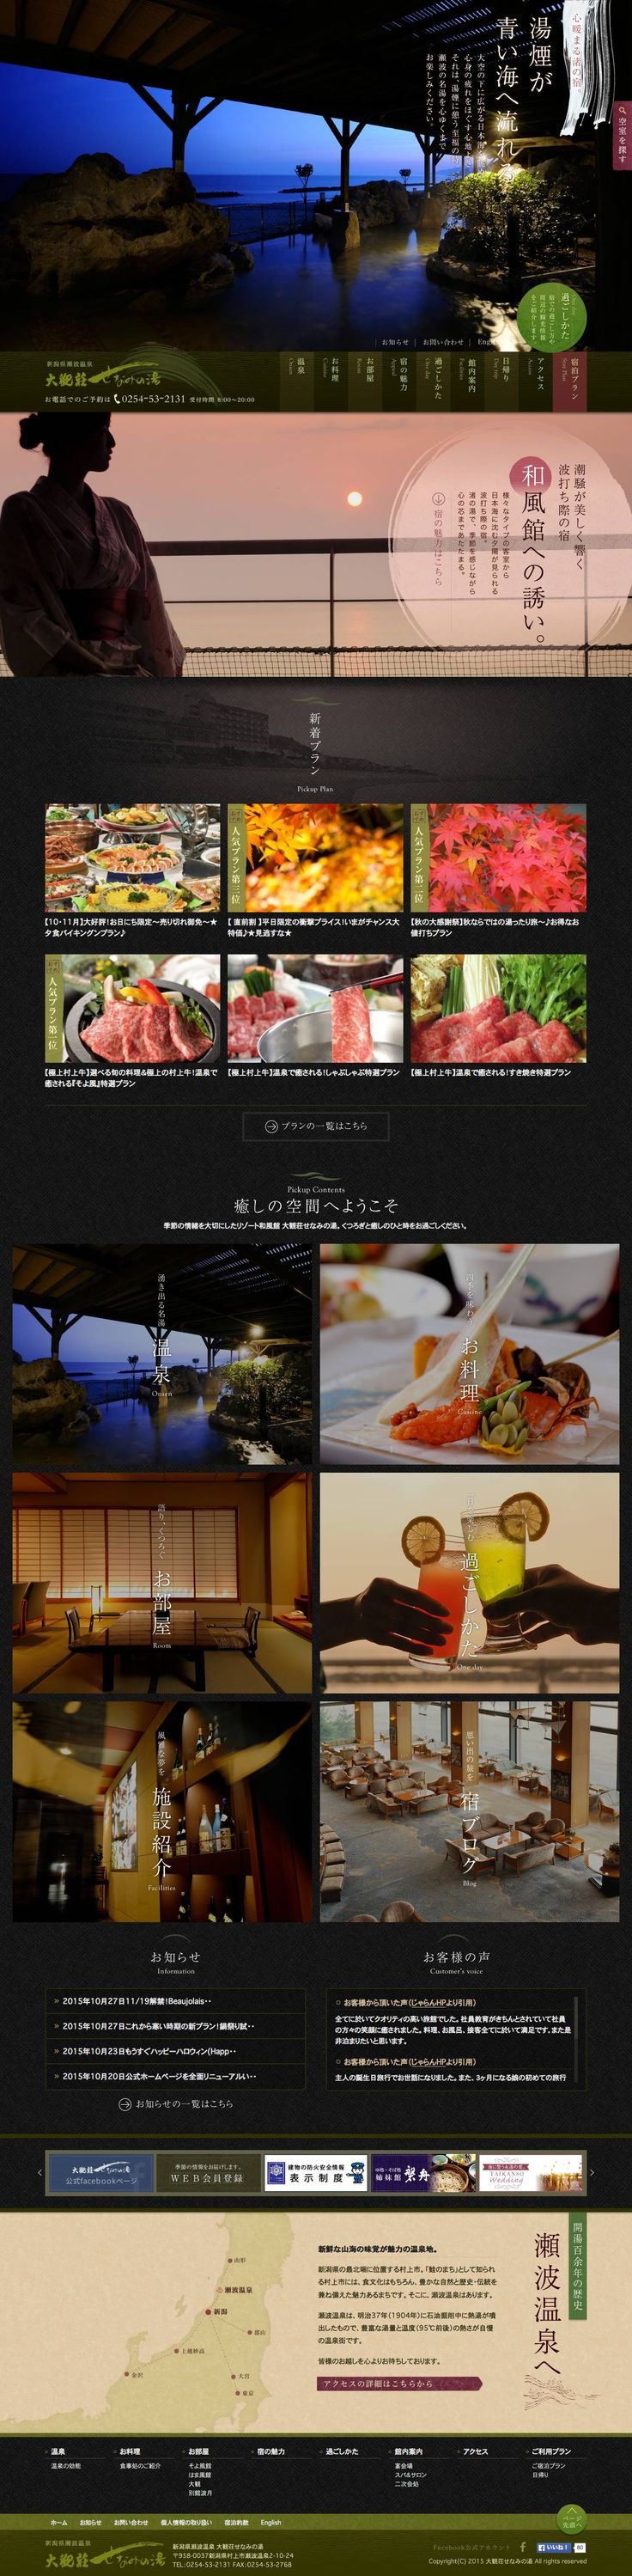 http://www.taikanso.senaminoyu.co.jp/